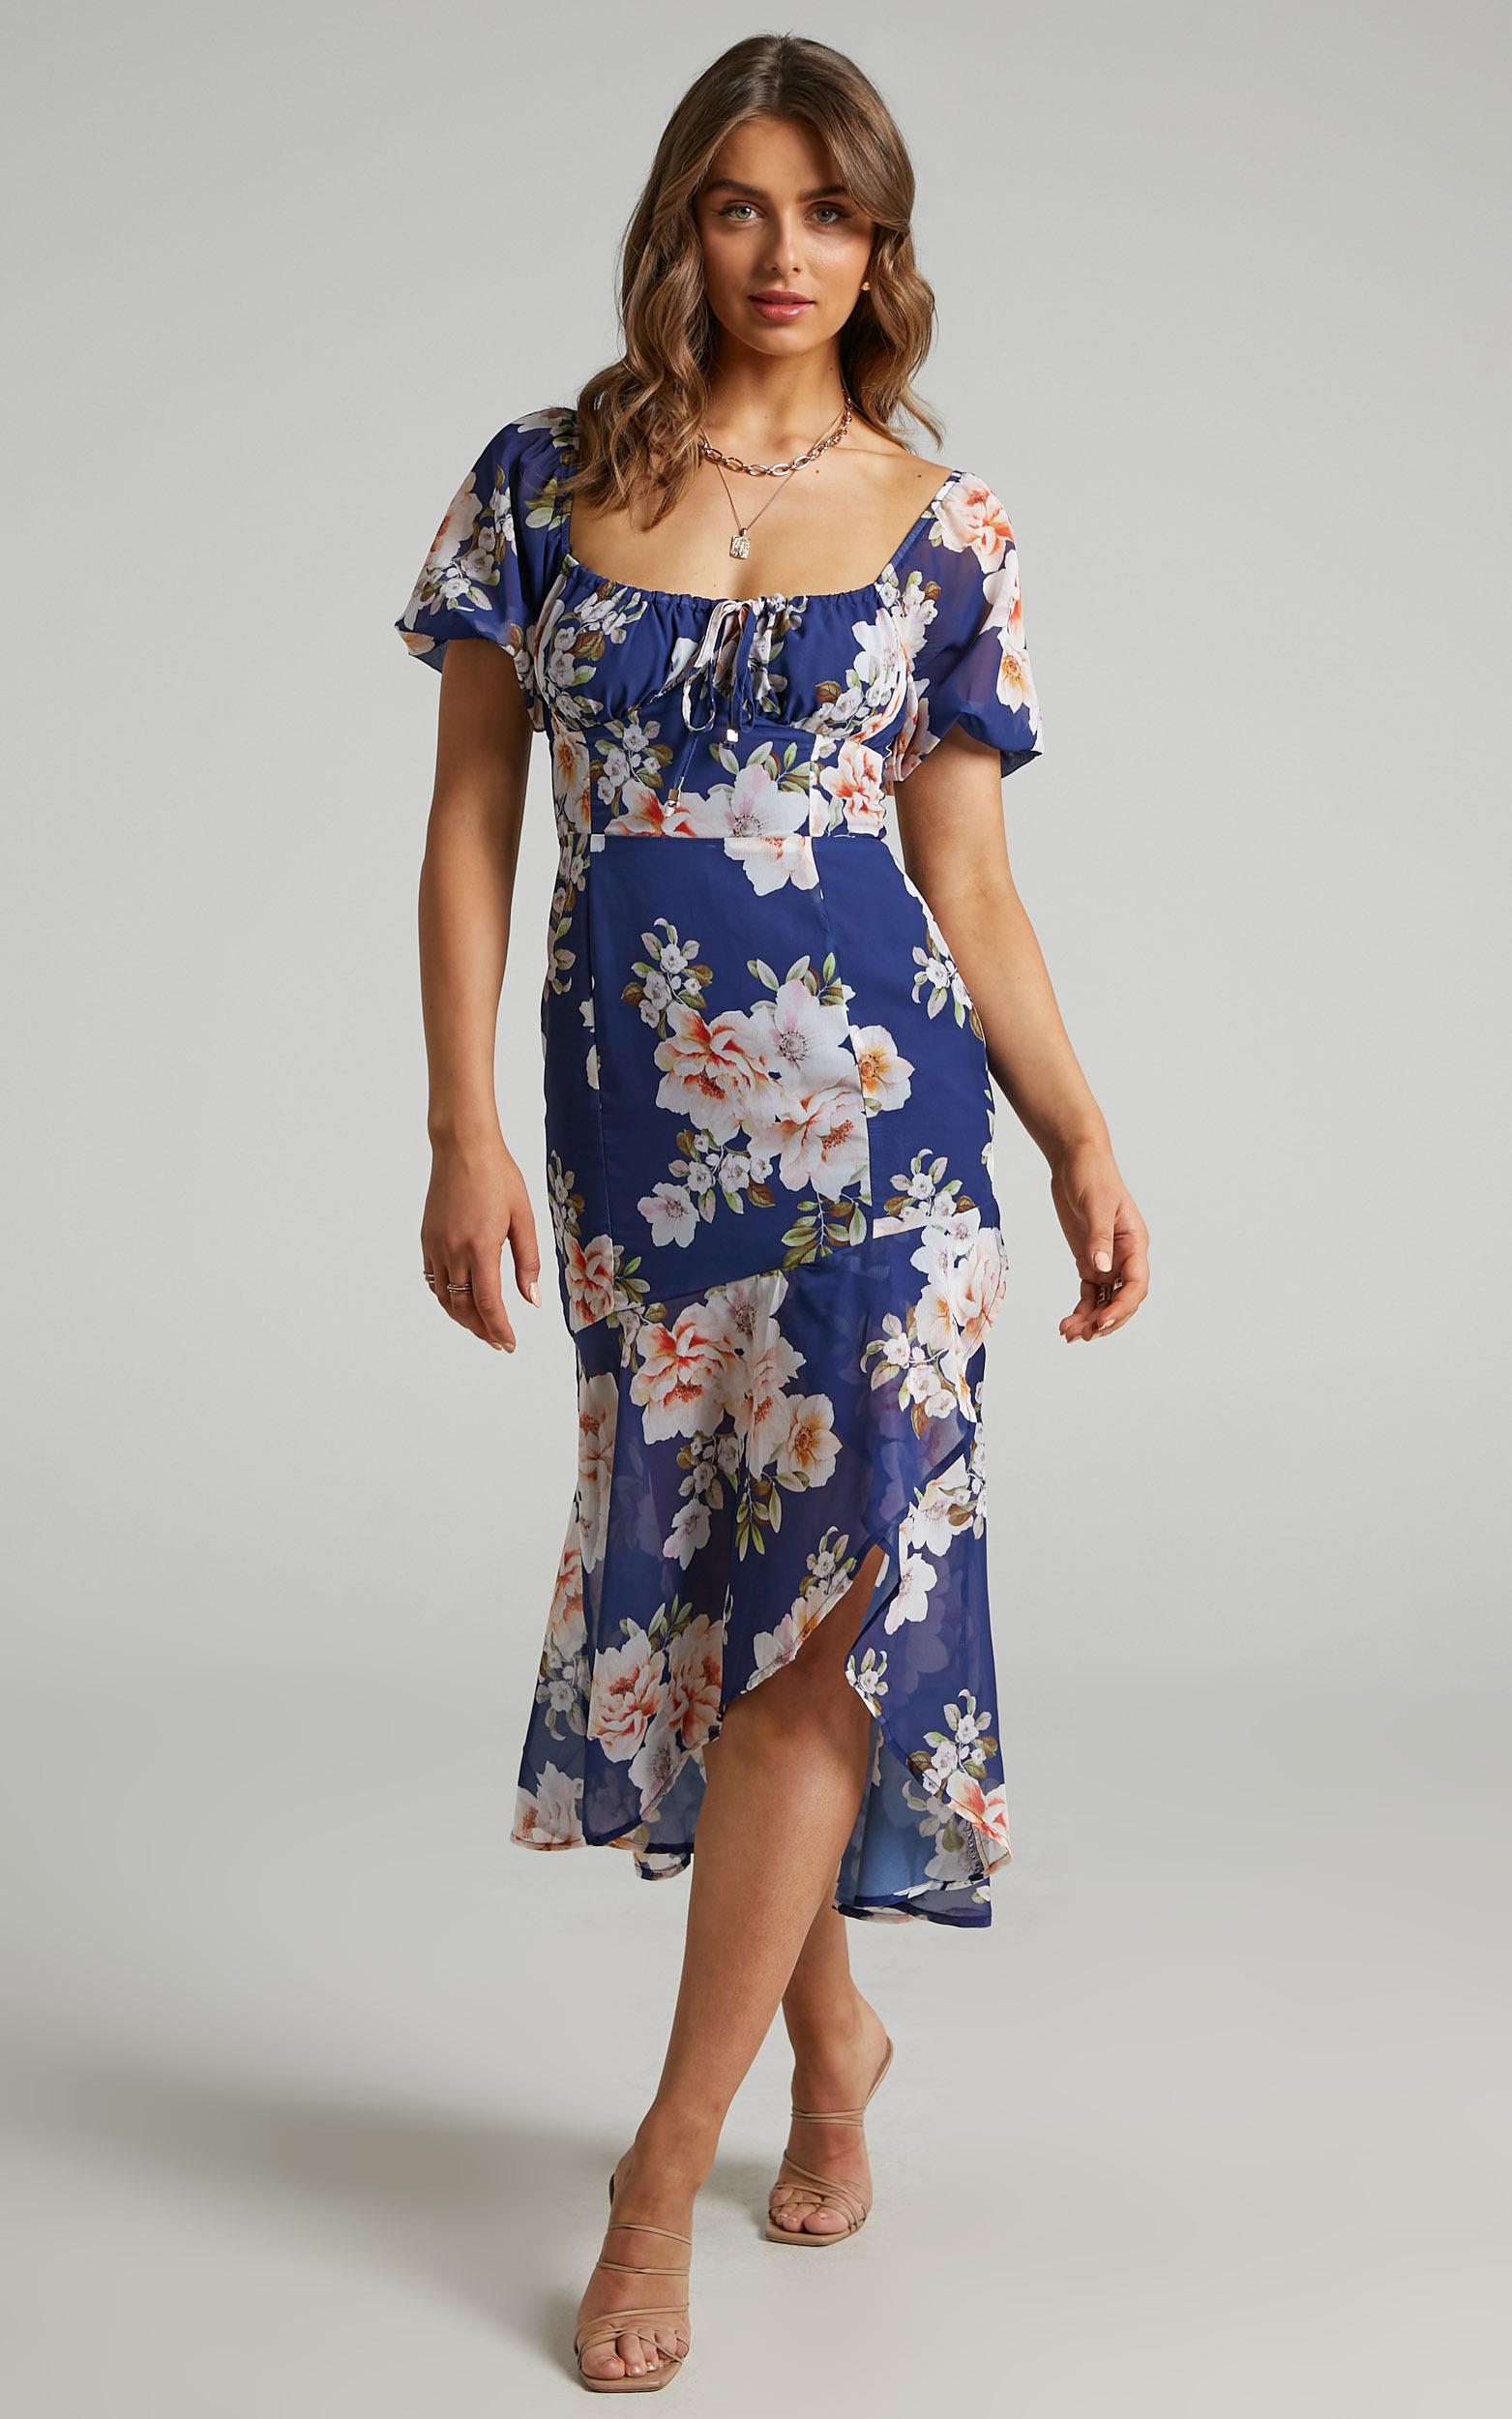 Jasalina Dress in Royal Floral - 06, NVY4, hi-res image number null